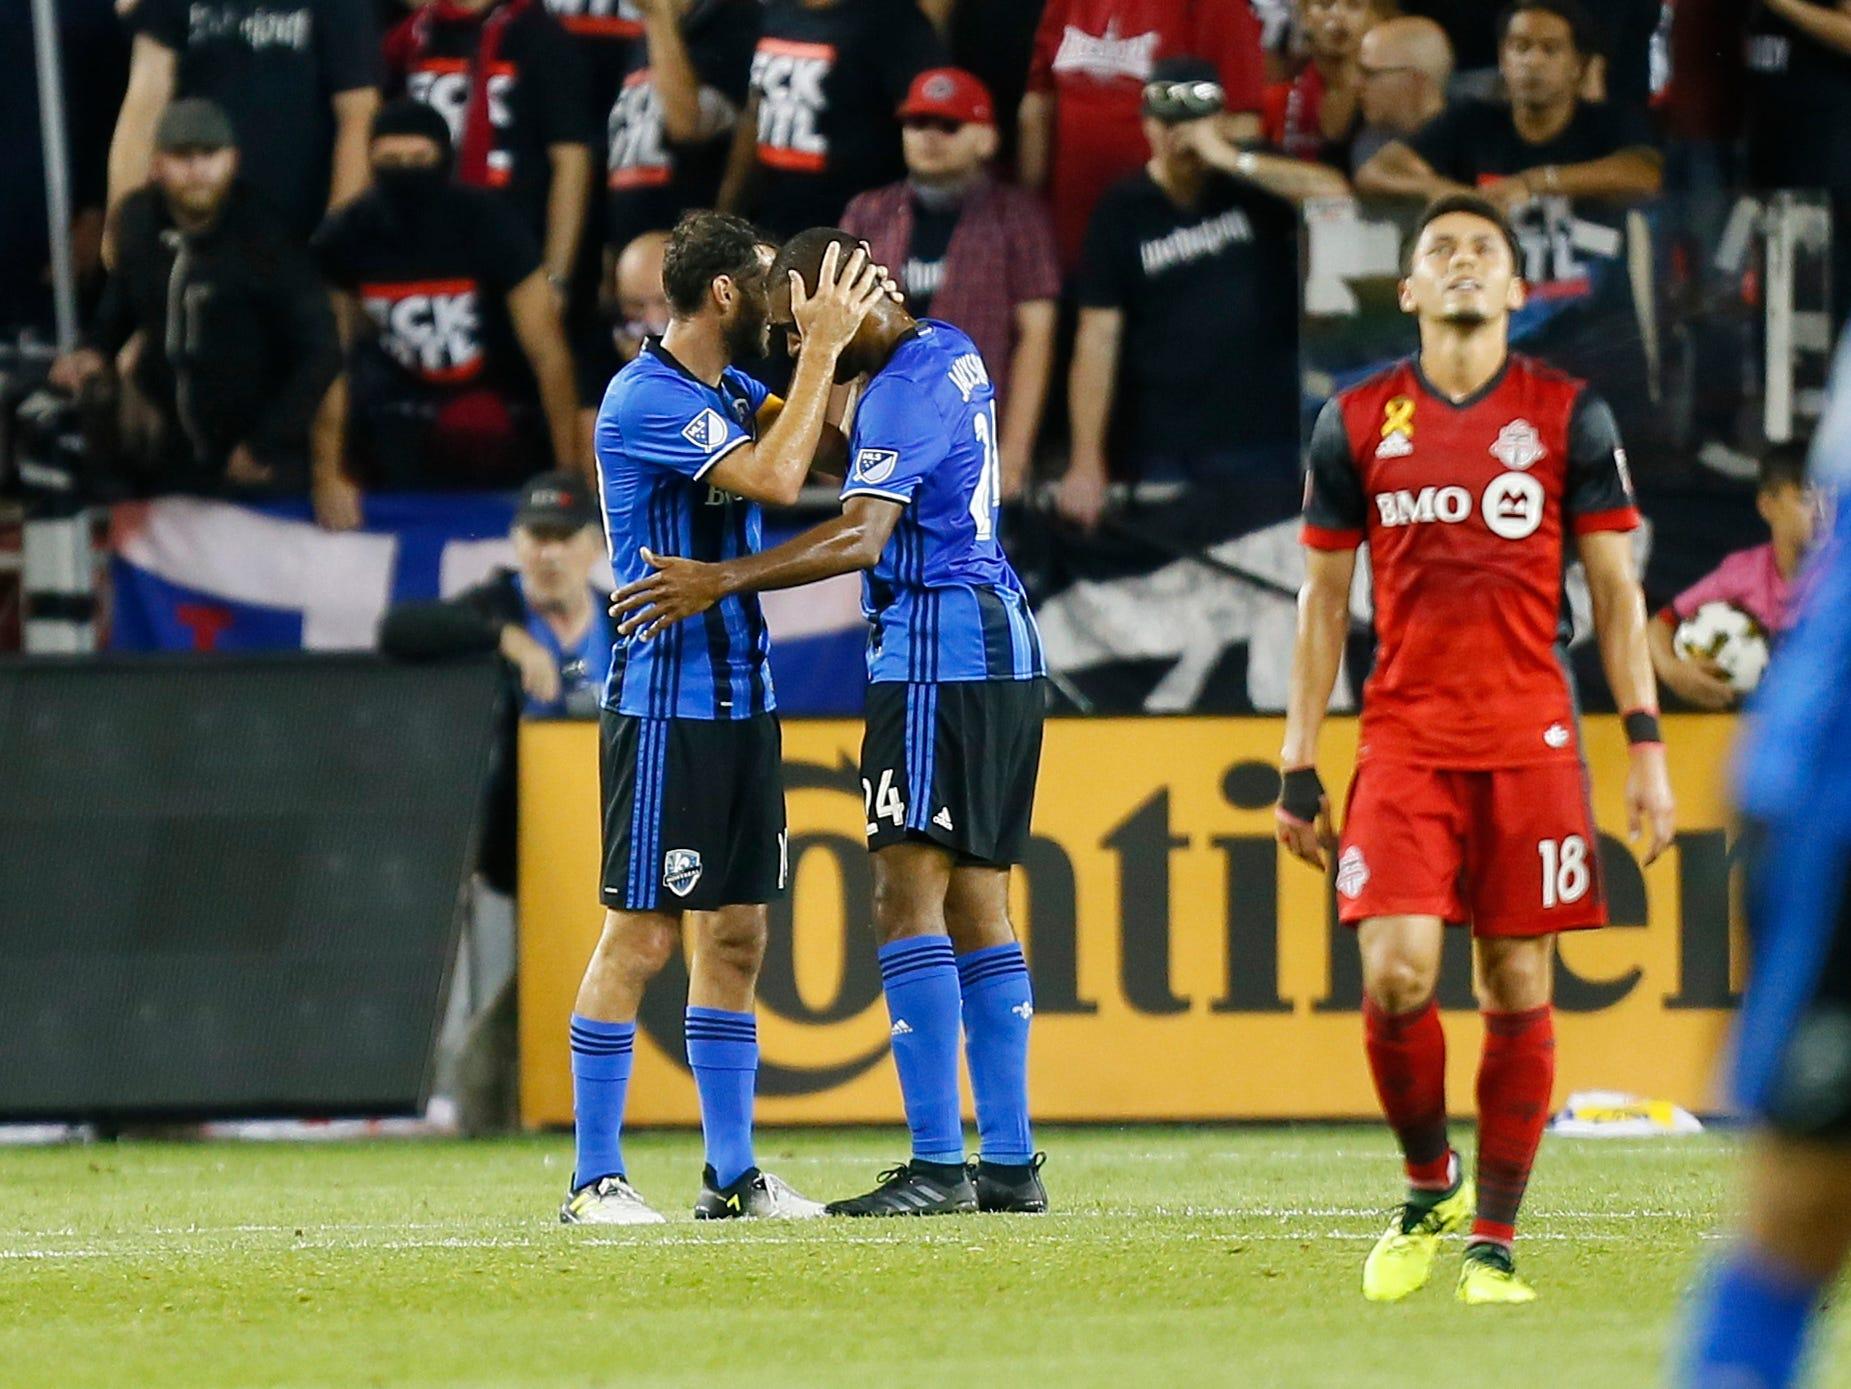 Montreal Impact ends Toronto FC's 11-match MLS unbeaten streak